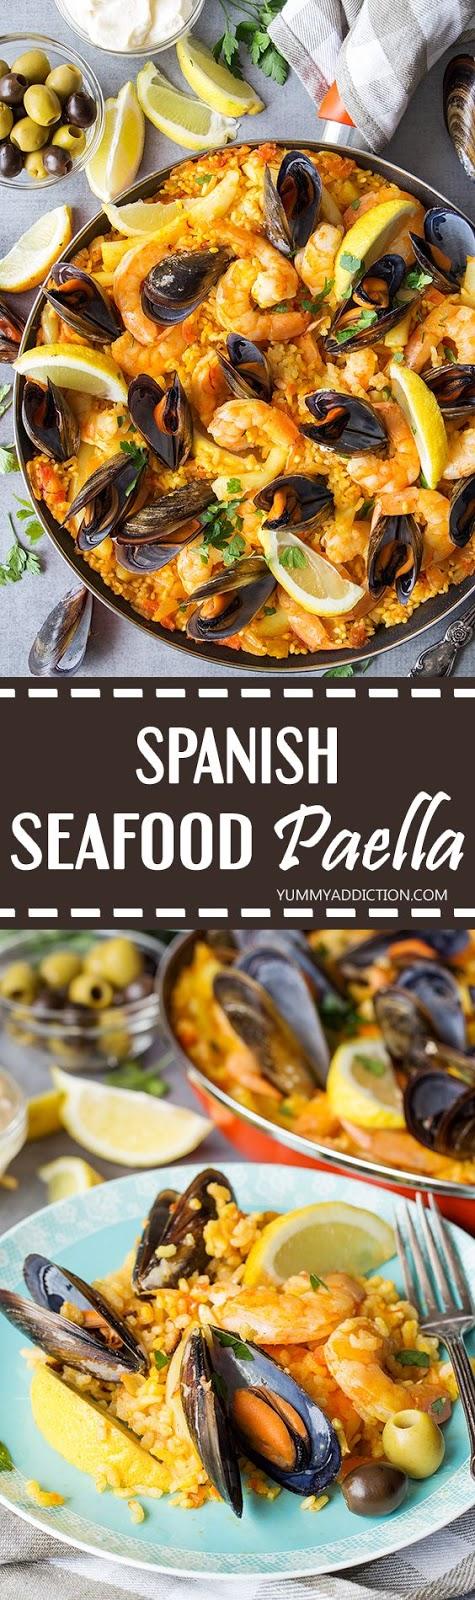 Spanísh Seafood Paella